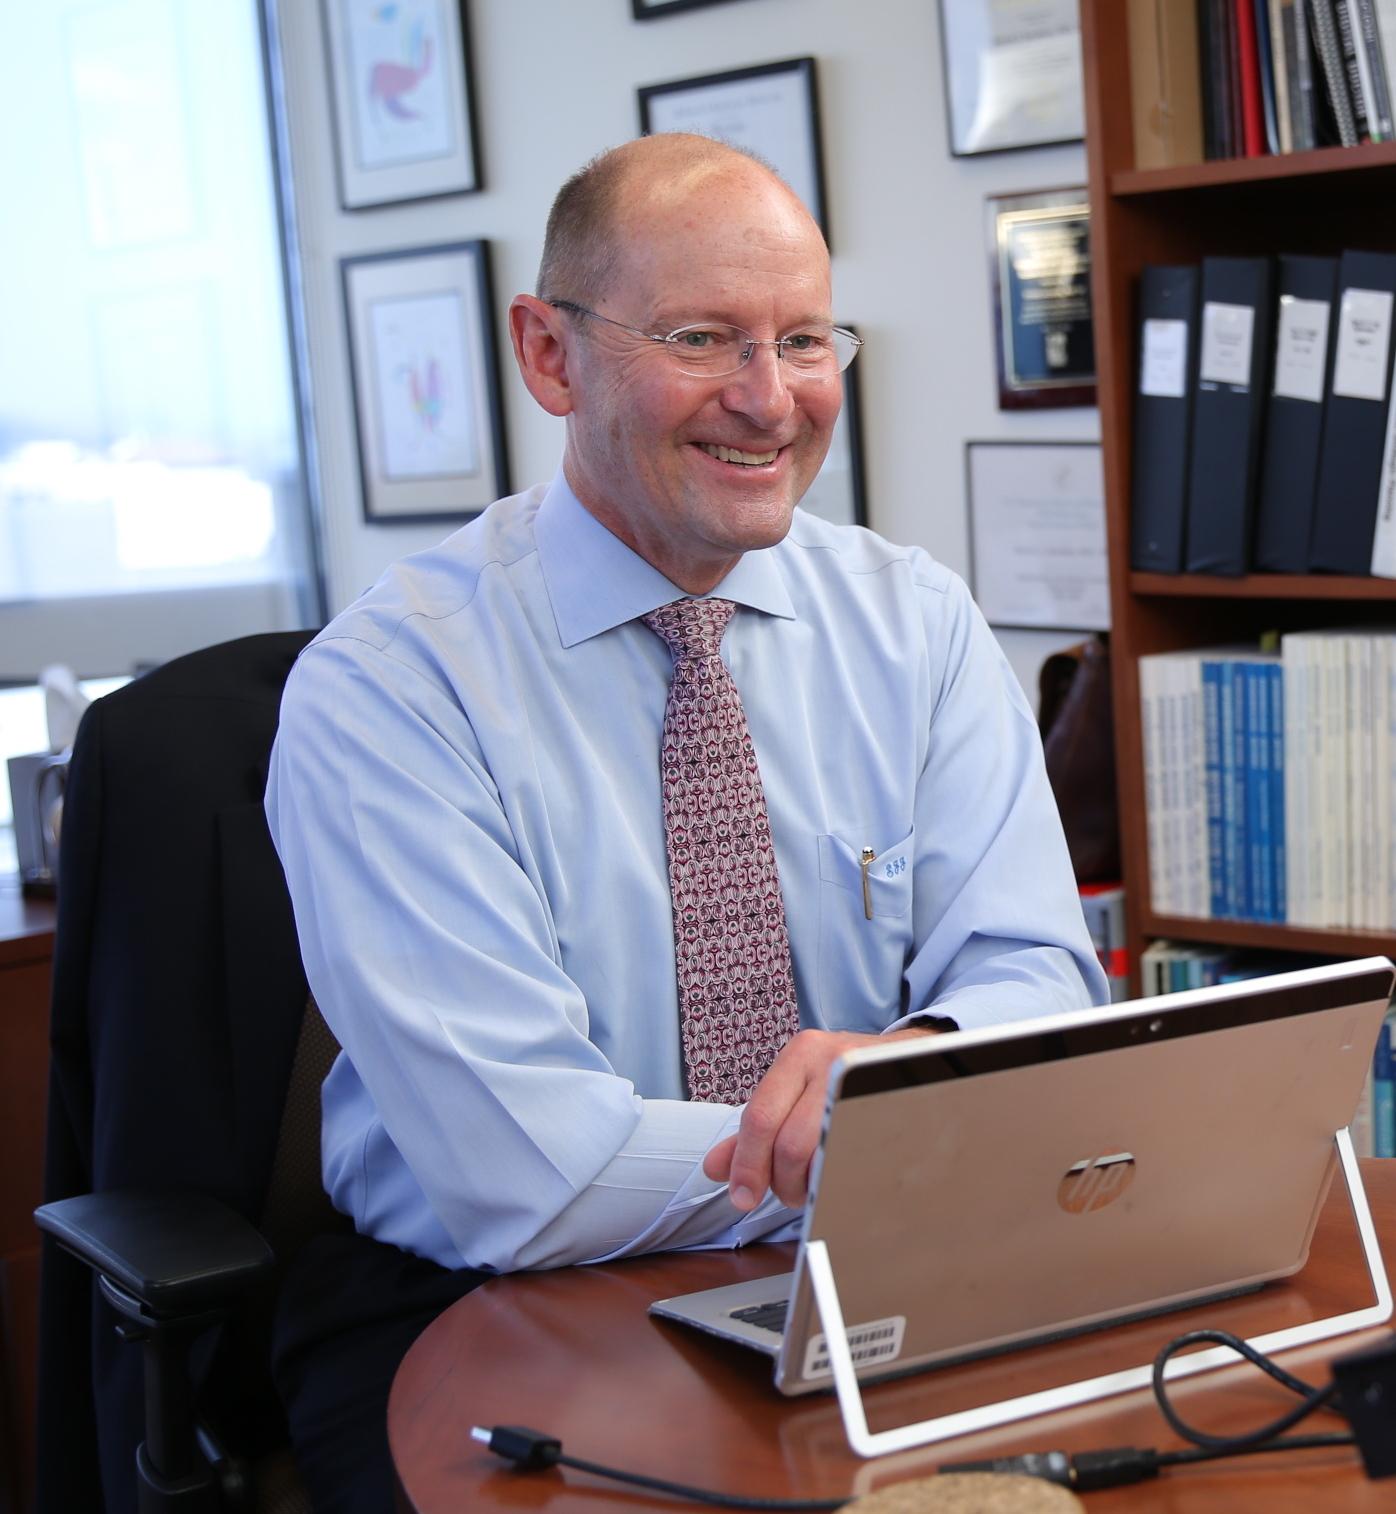 Dr. Steven Jacobsen in his office